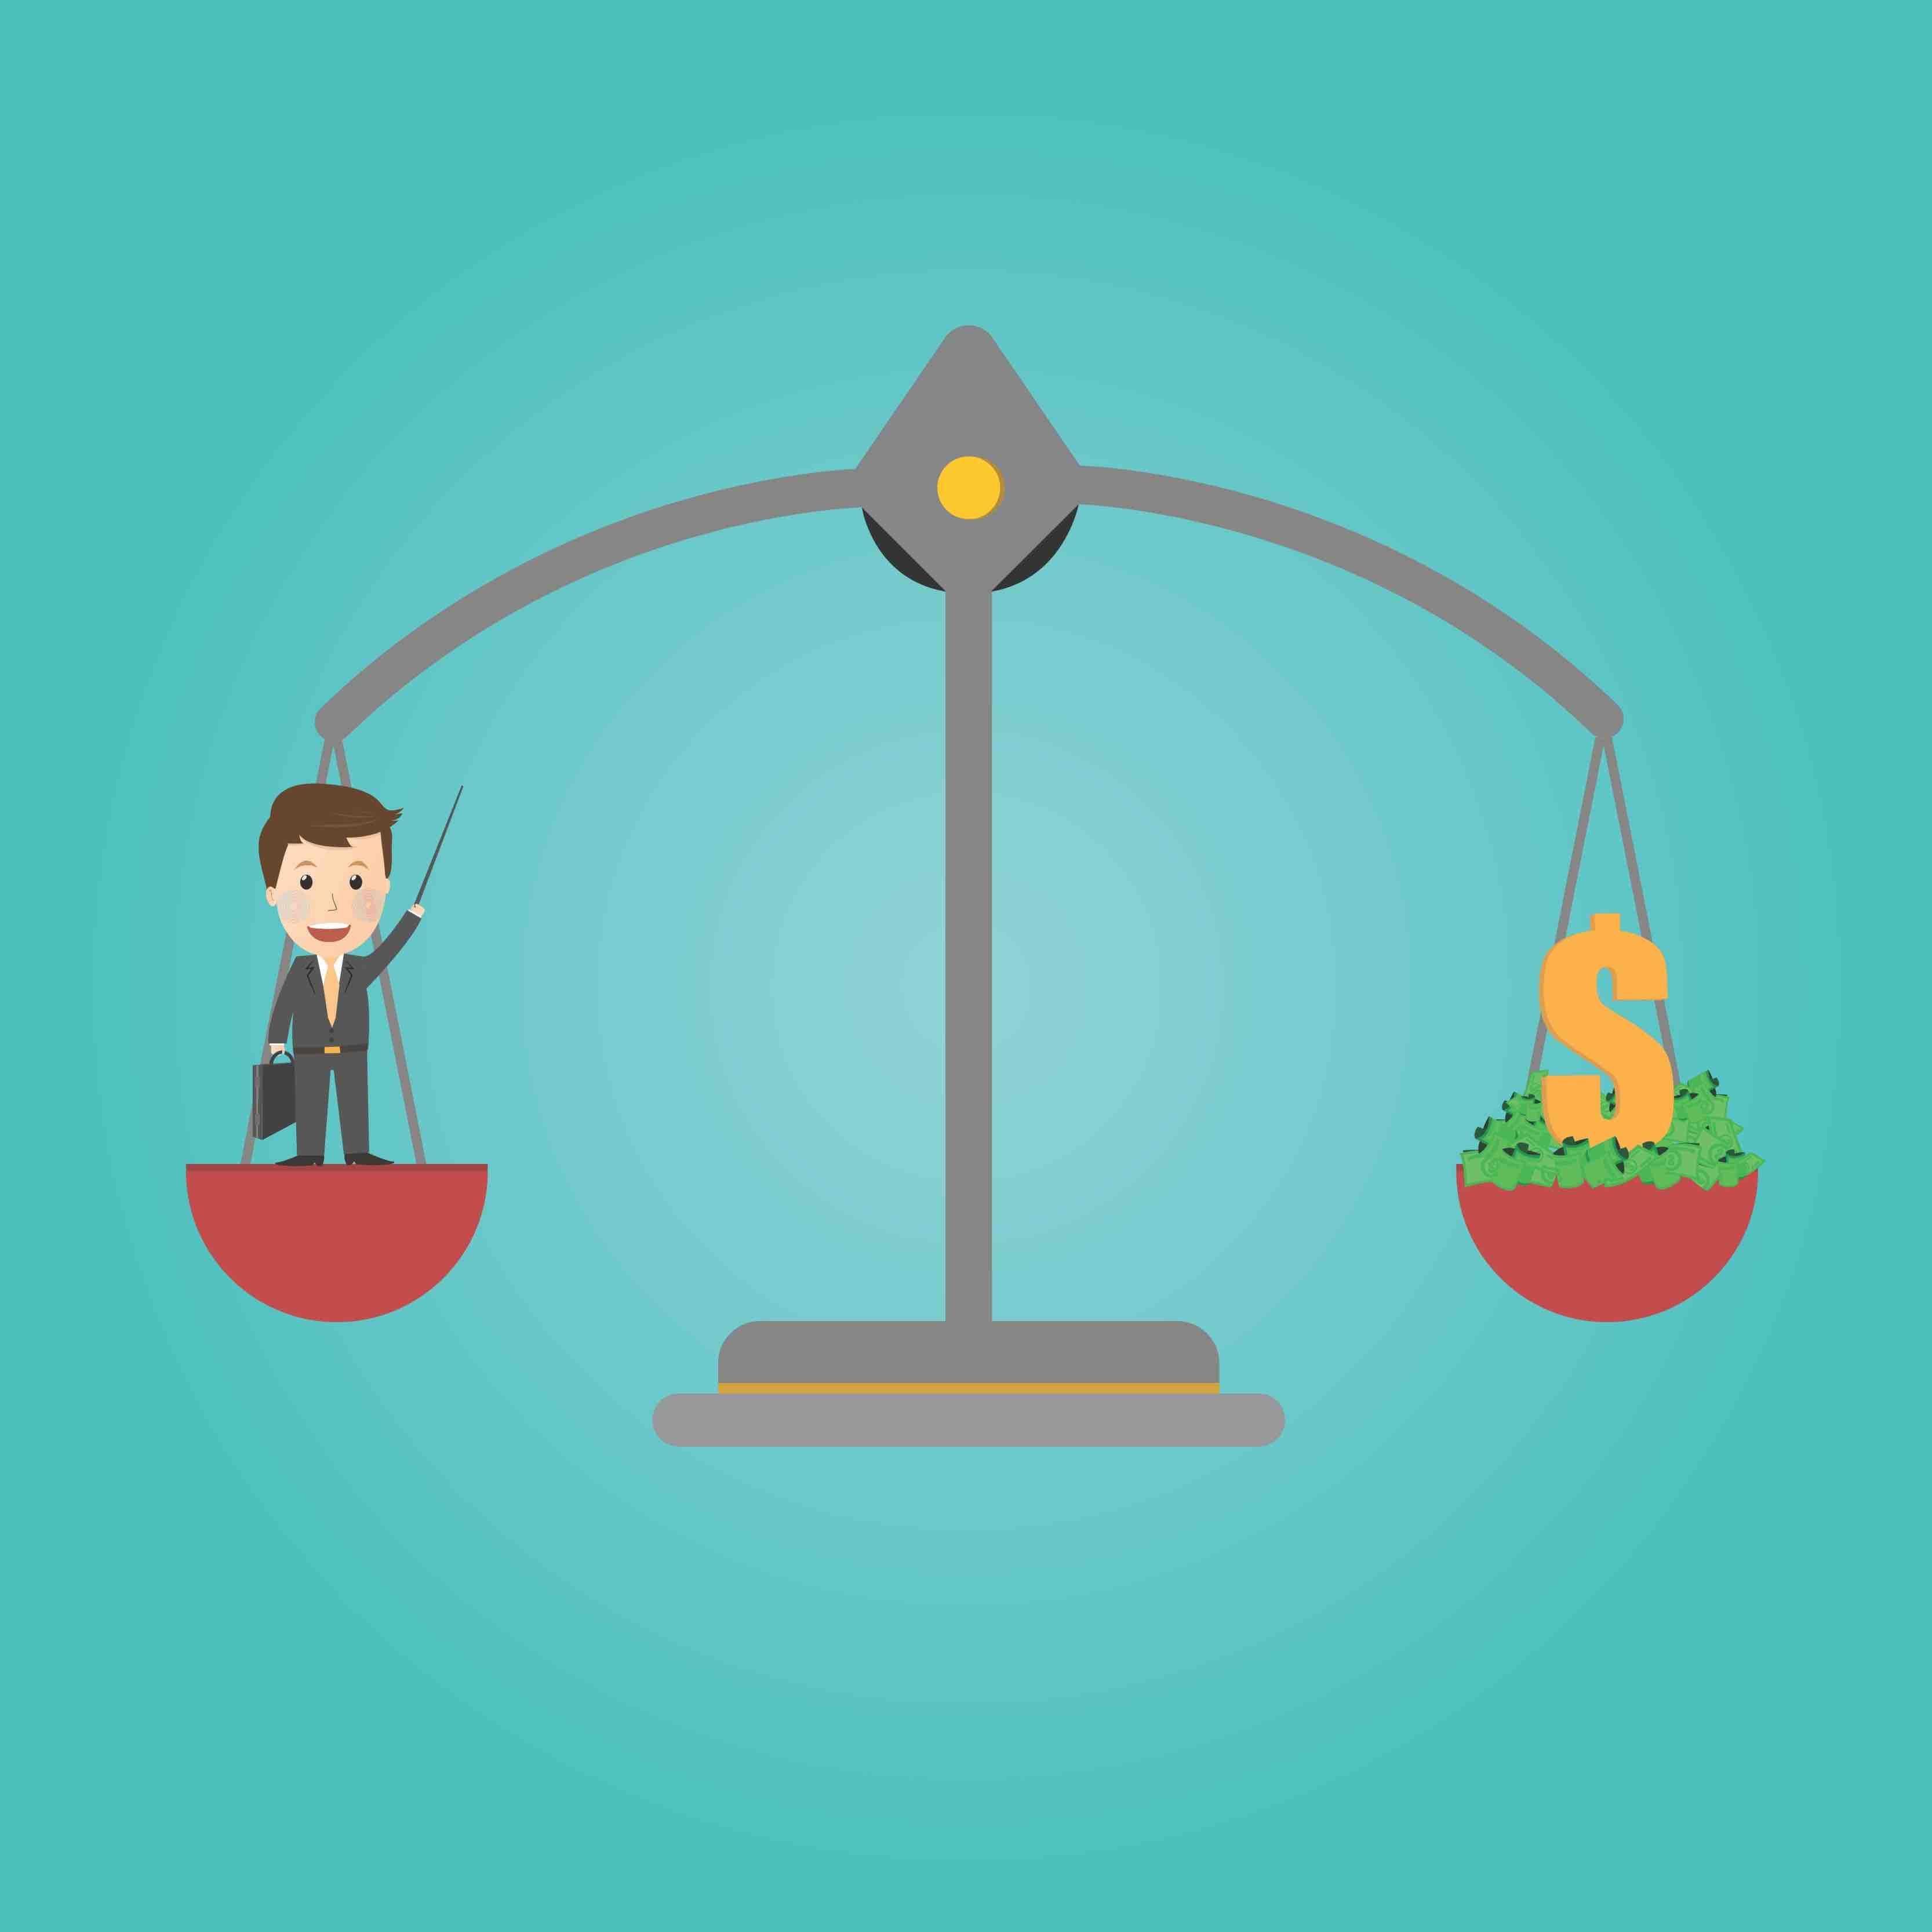 weighing options between Hard Money Loan vs Equity